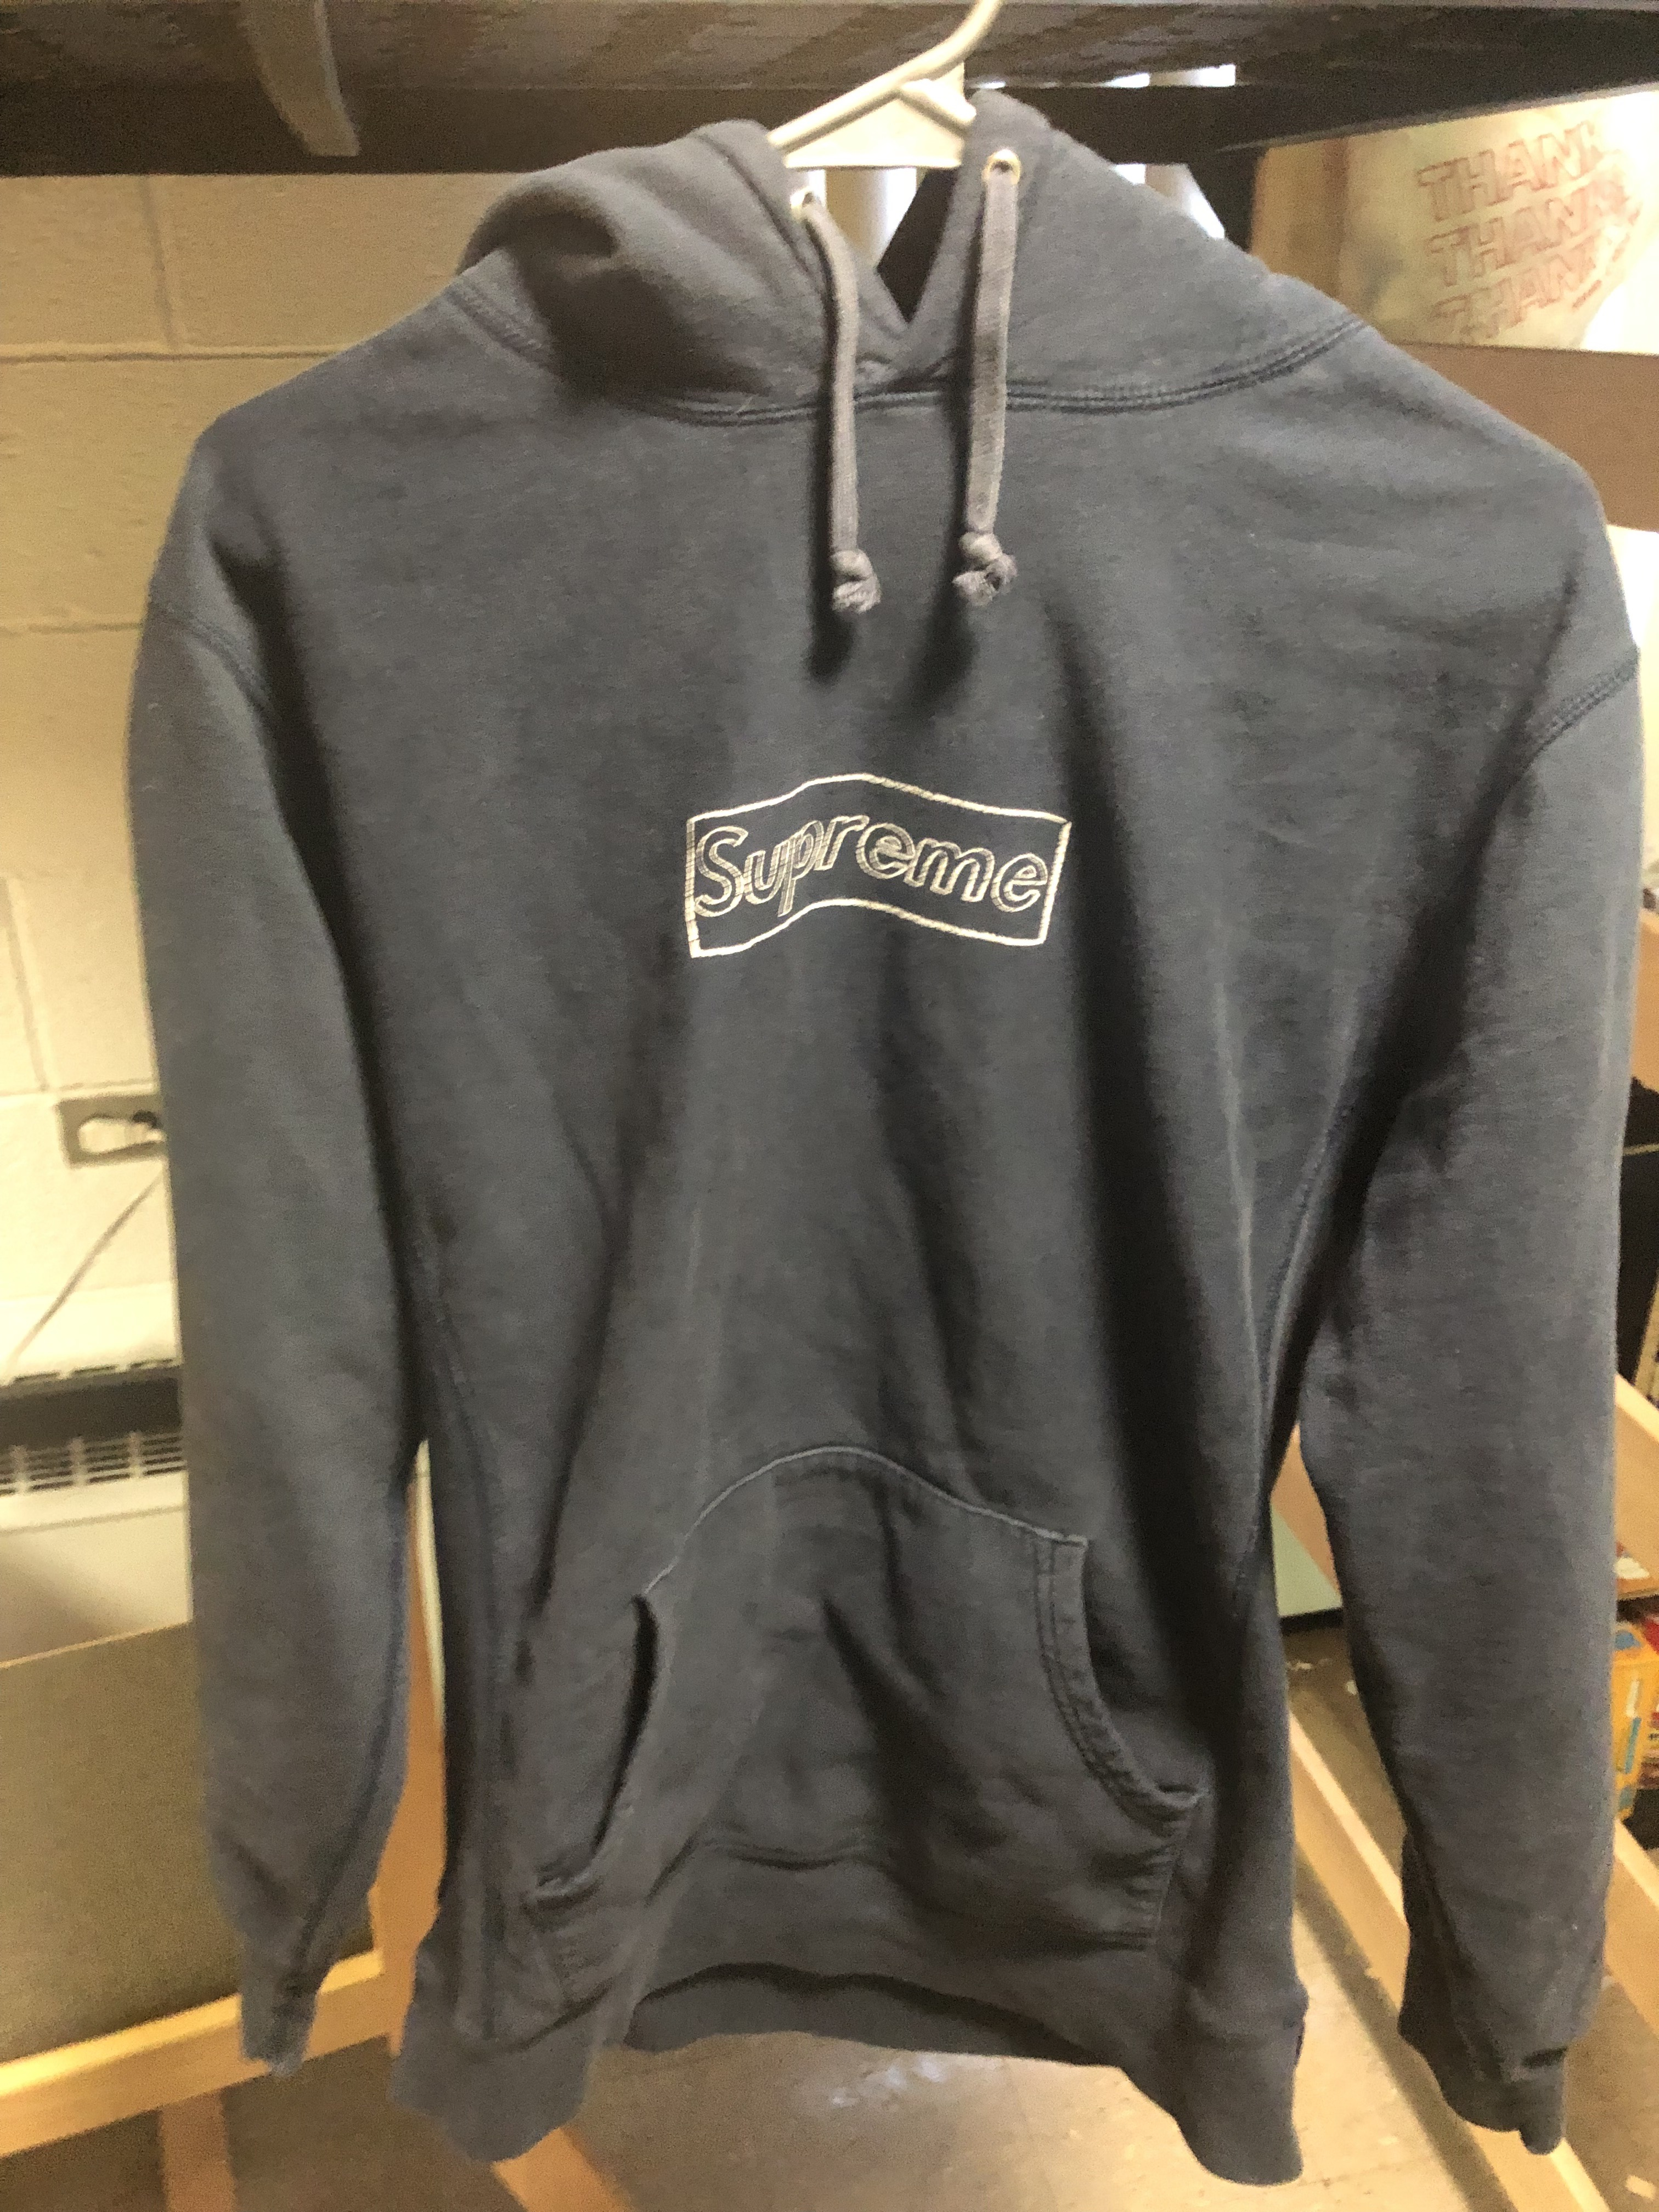 4c72f1ec5fbf Supreme Supreme x Kaws Box Logo Hoodie Size l - Sweatshirts   Hoodies for  Sale - Grailed